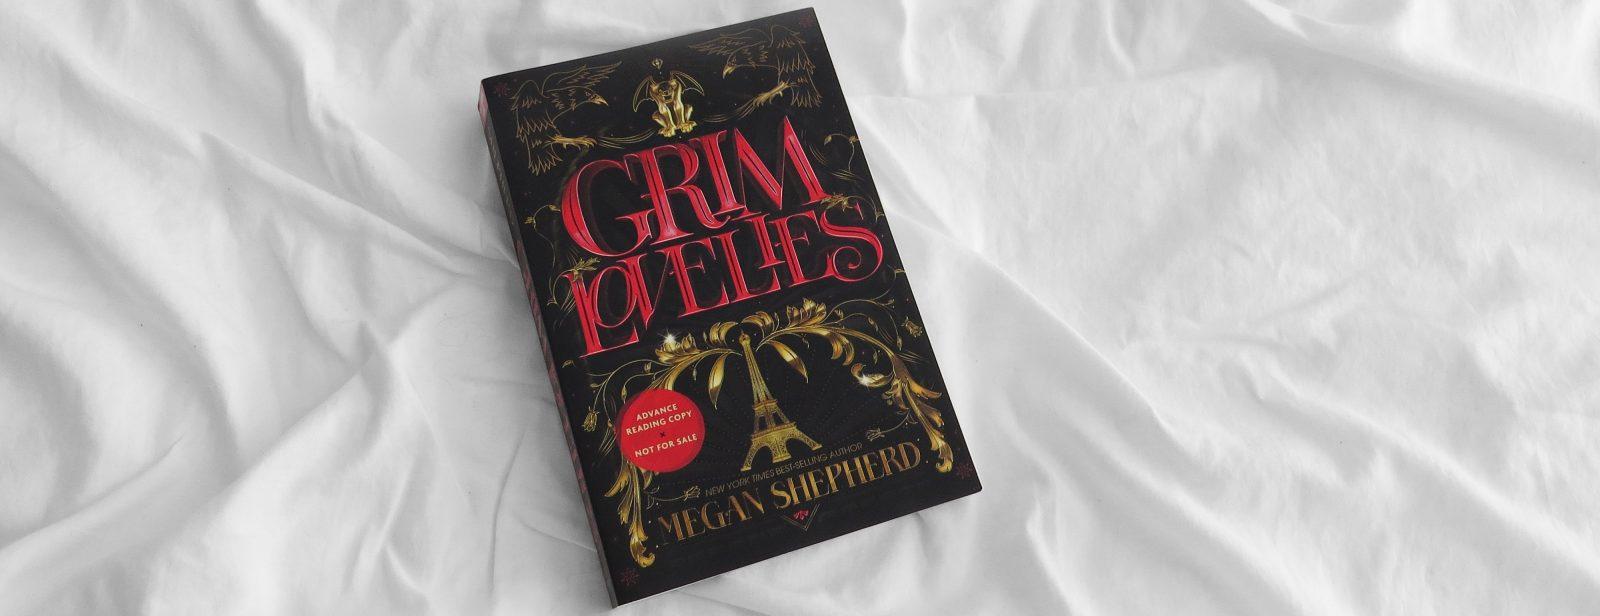 Blog Tour | Grim Lovelies by Megan Shepherd Review + Q&A